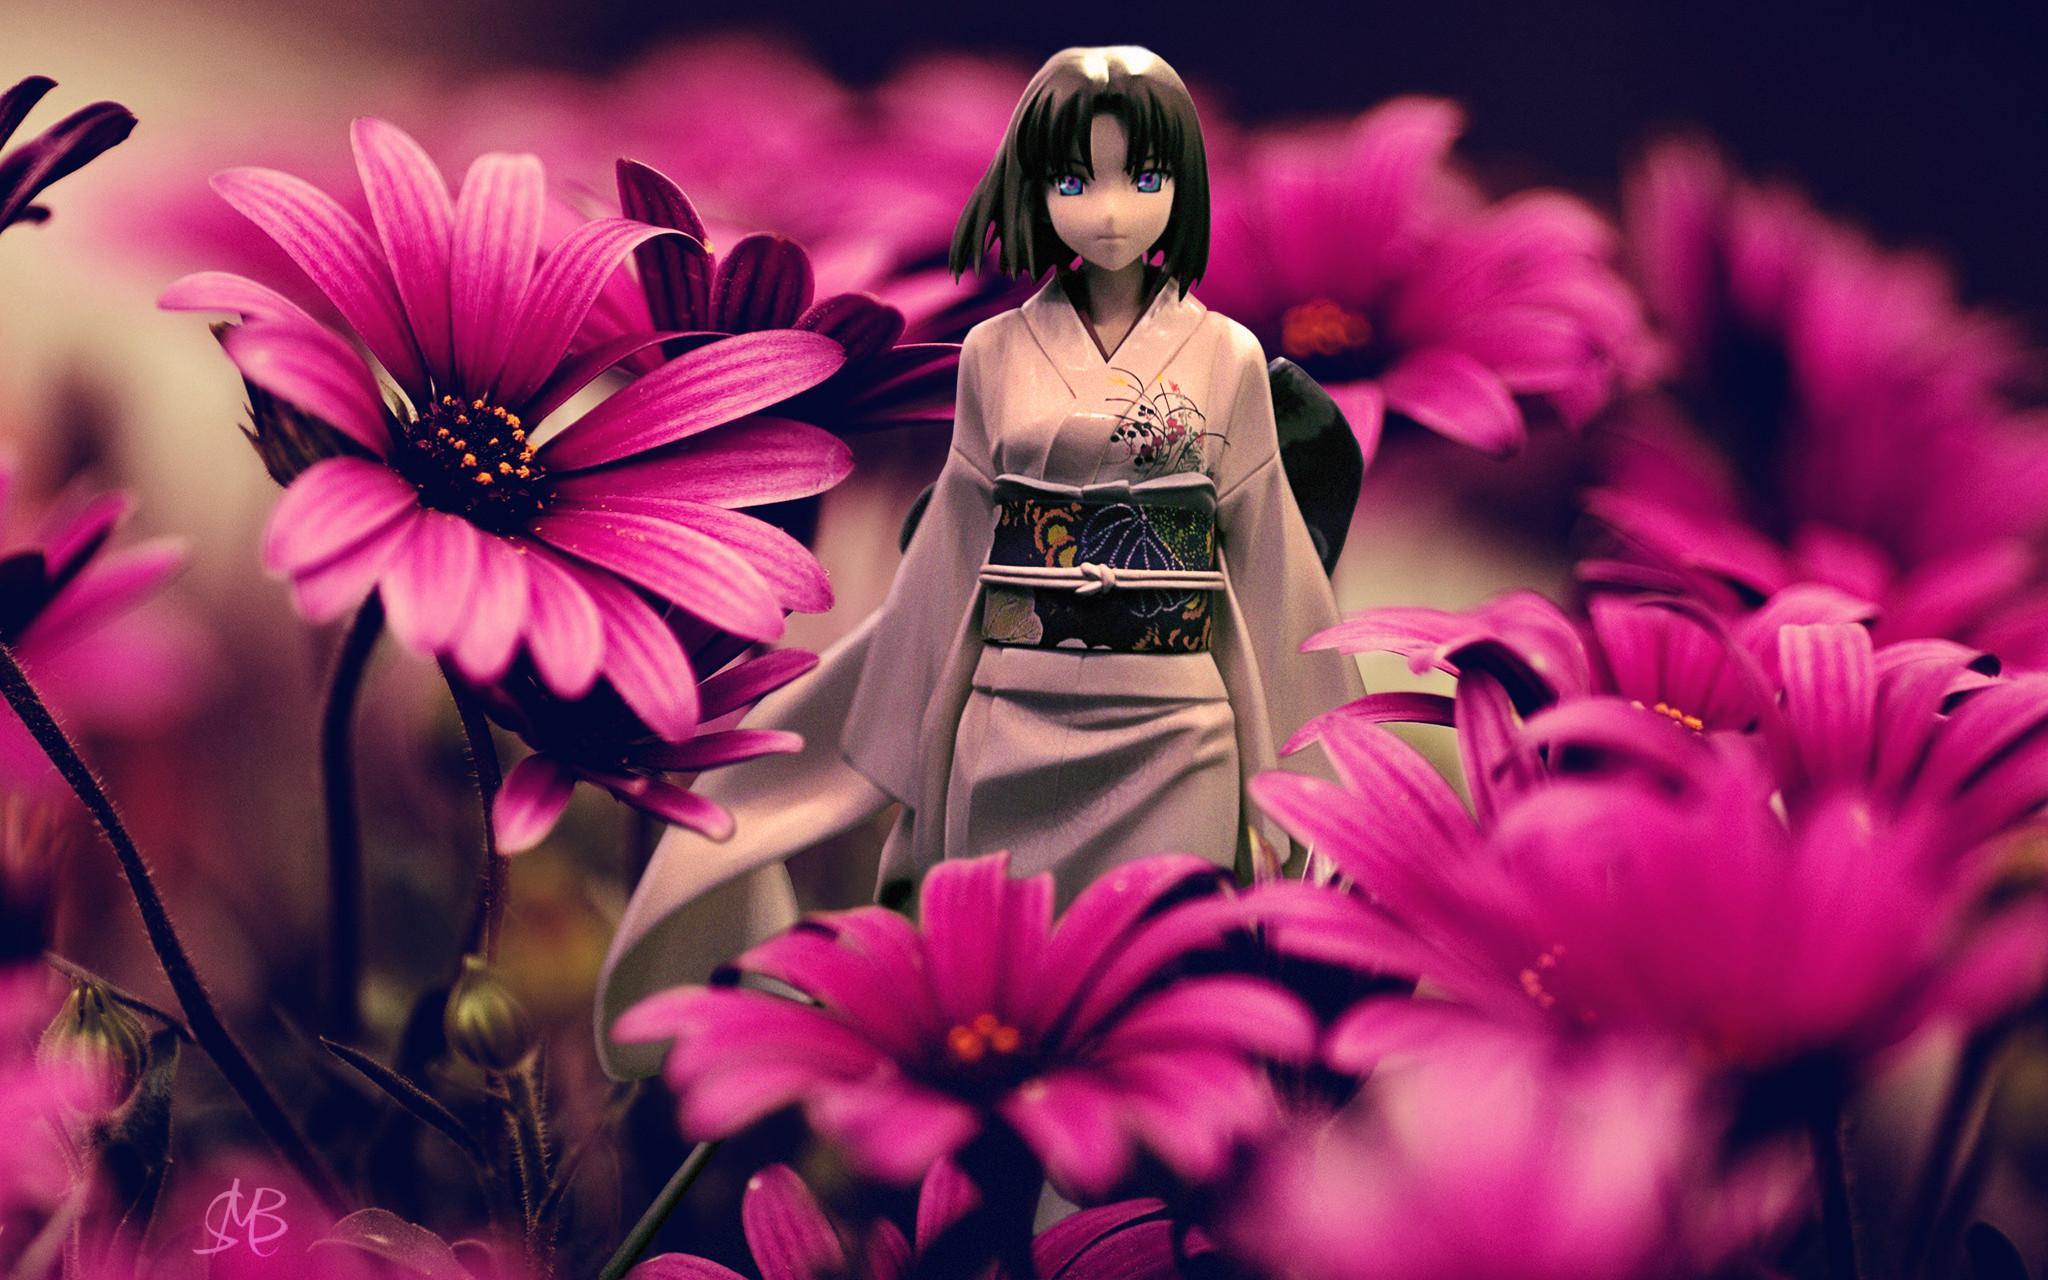 kimono flowers japanese_clothes female sword type_moon ryougi_shiki good_smile_company kara_no_kyoukai nendoron nanashi aniplex ufotable nasu_kinoko female_figure